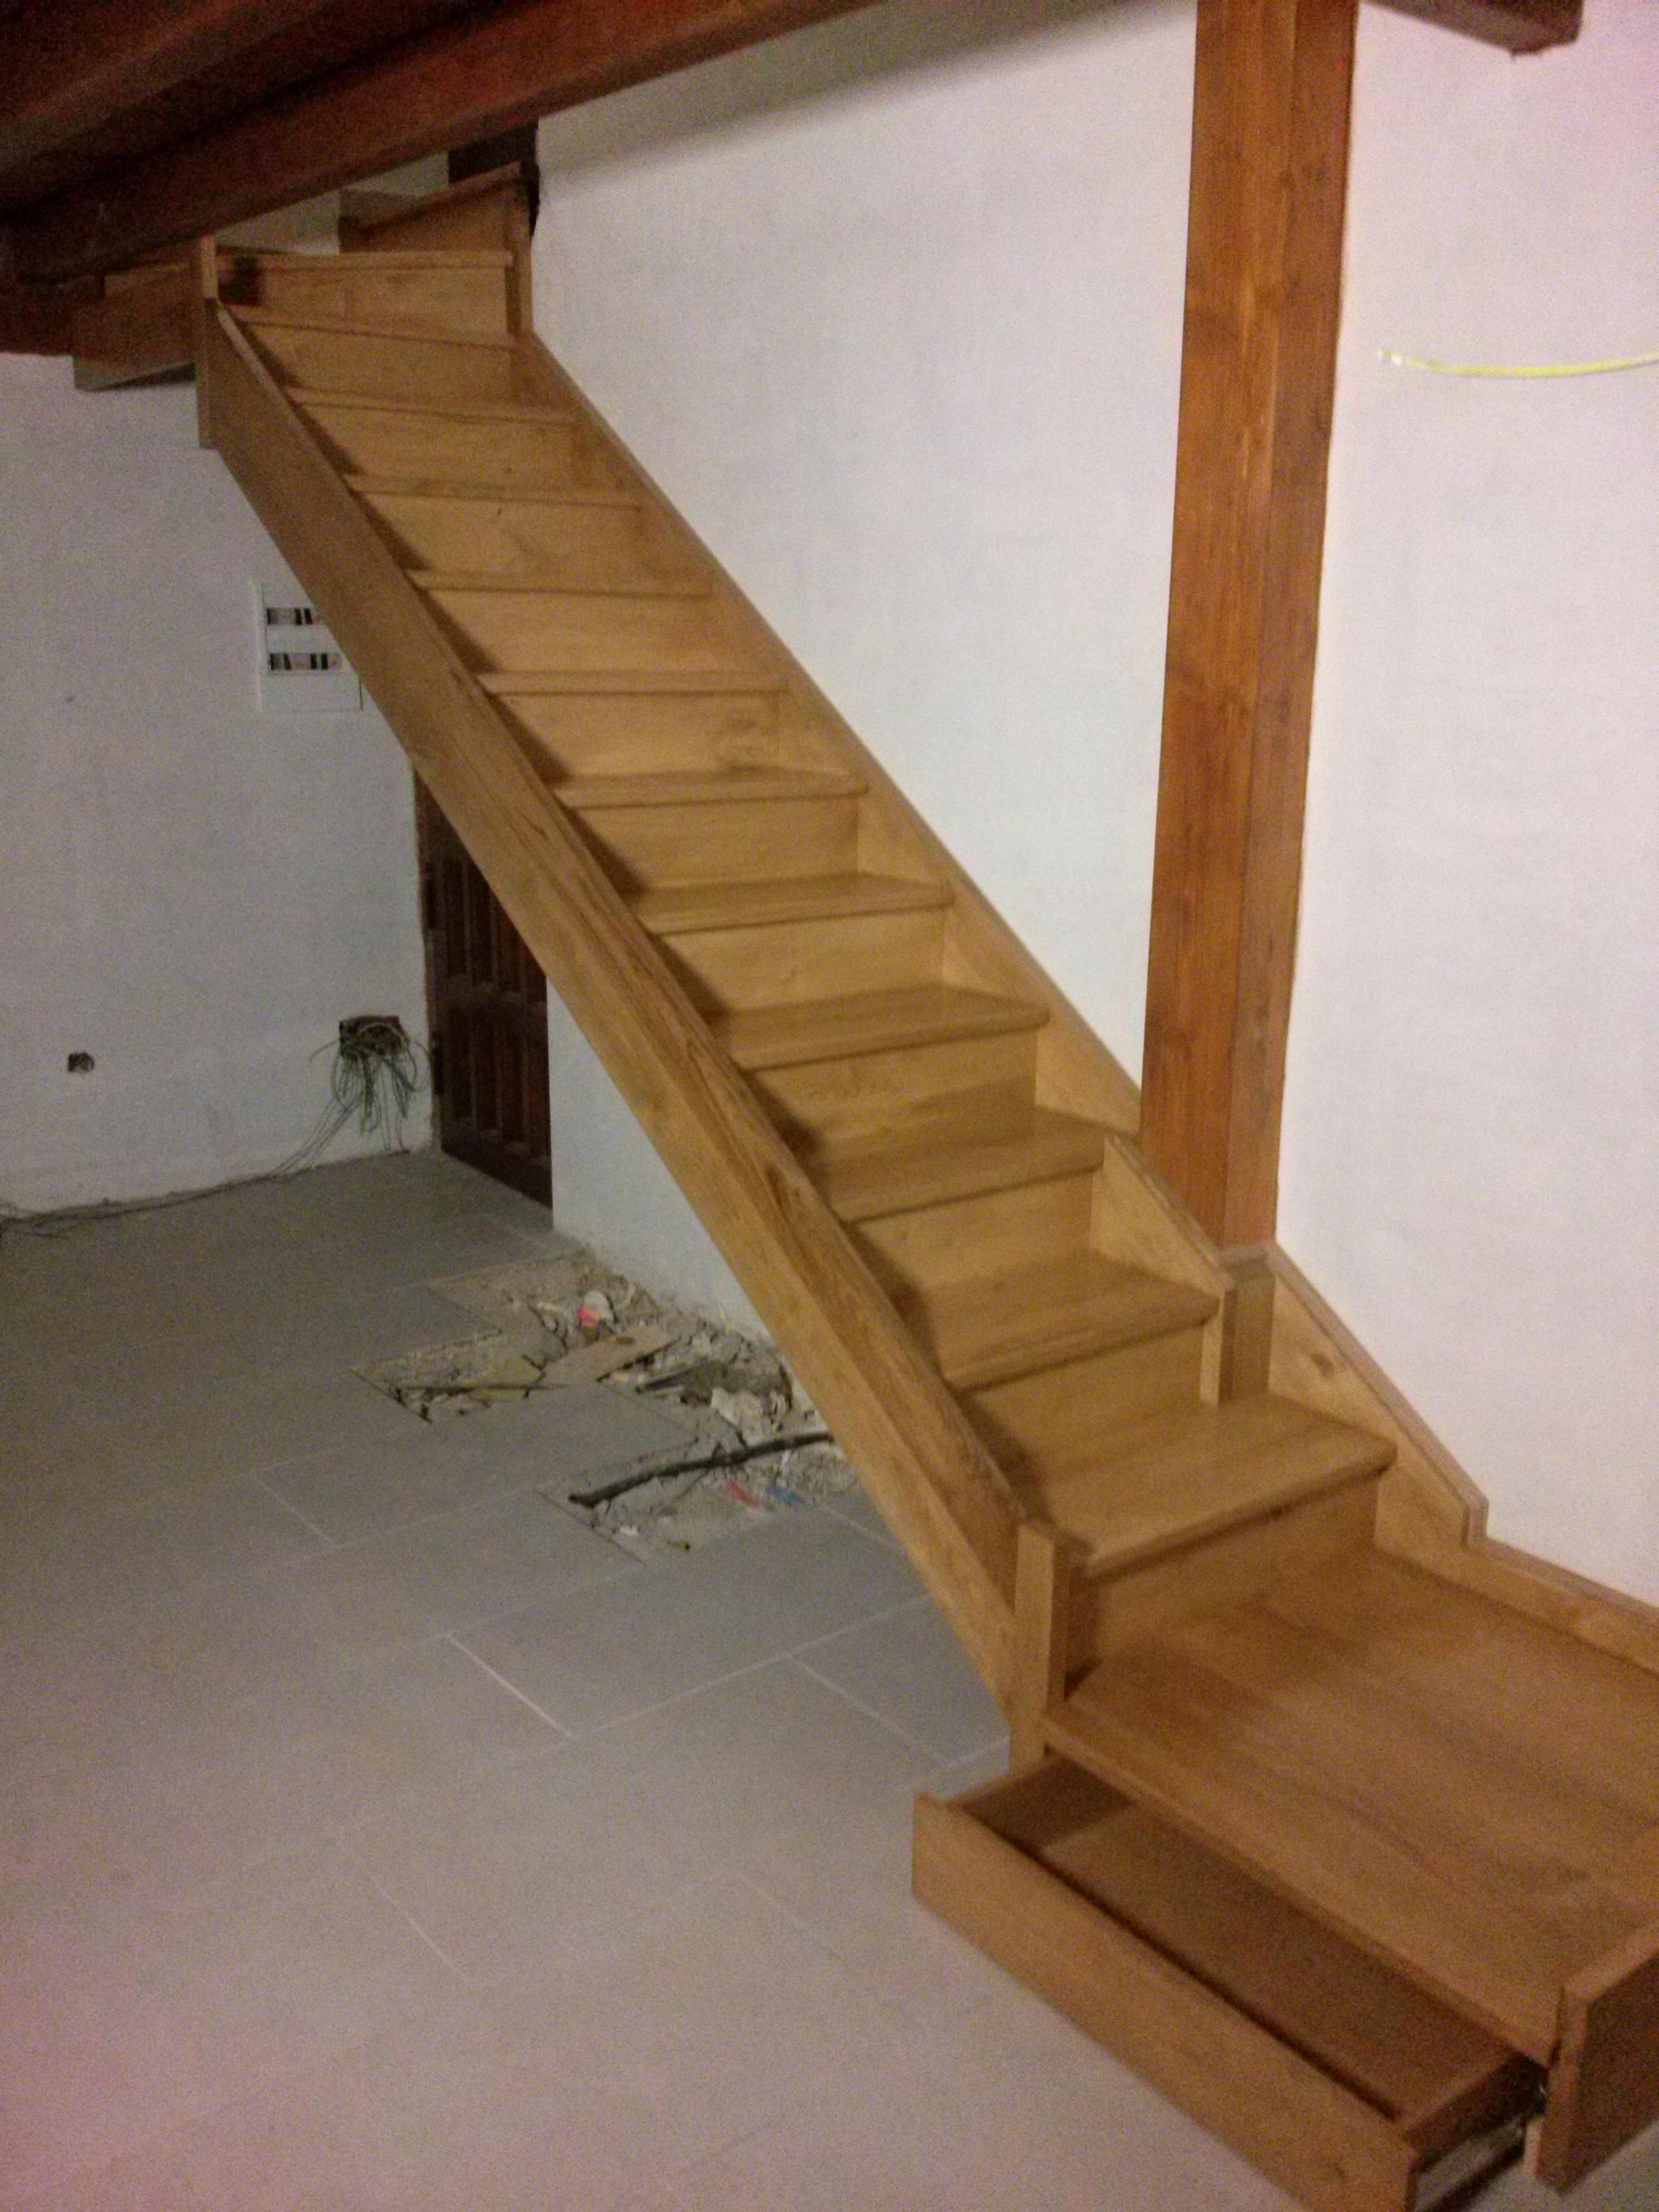 Contraventanas de madera precios for Casillas de madera precios